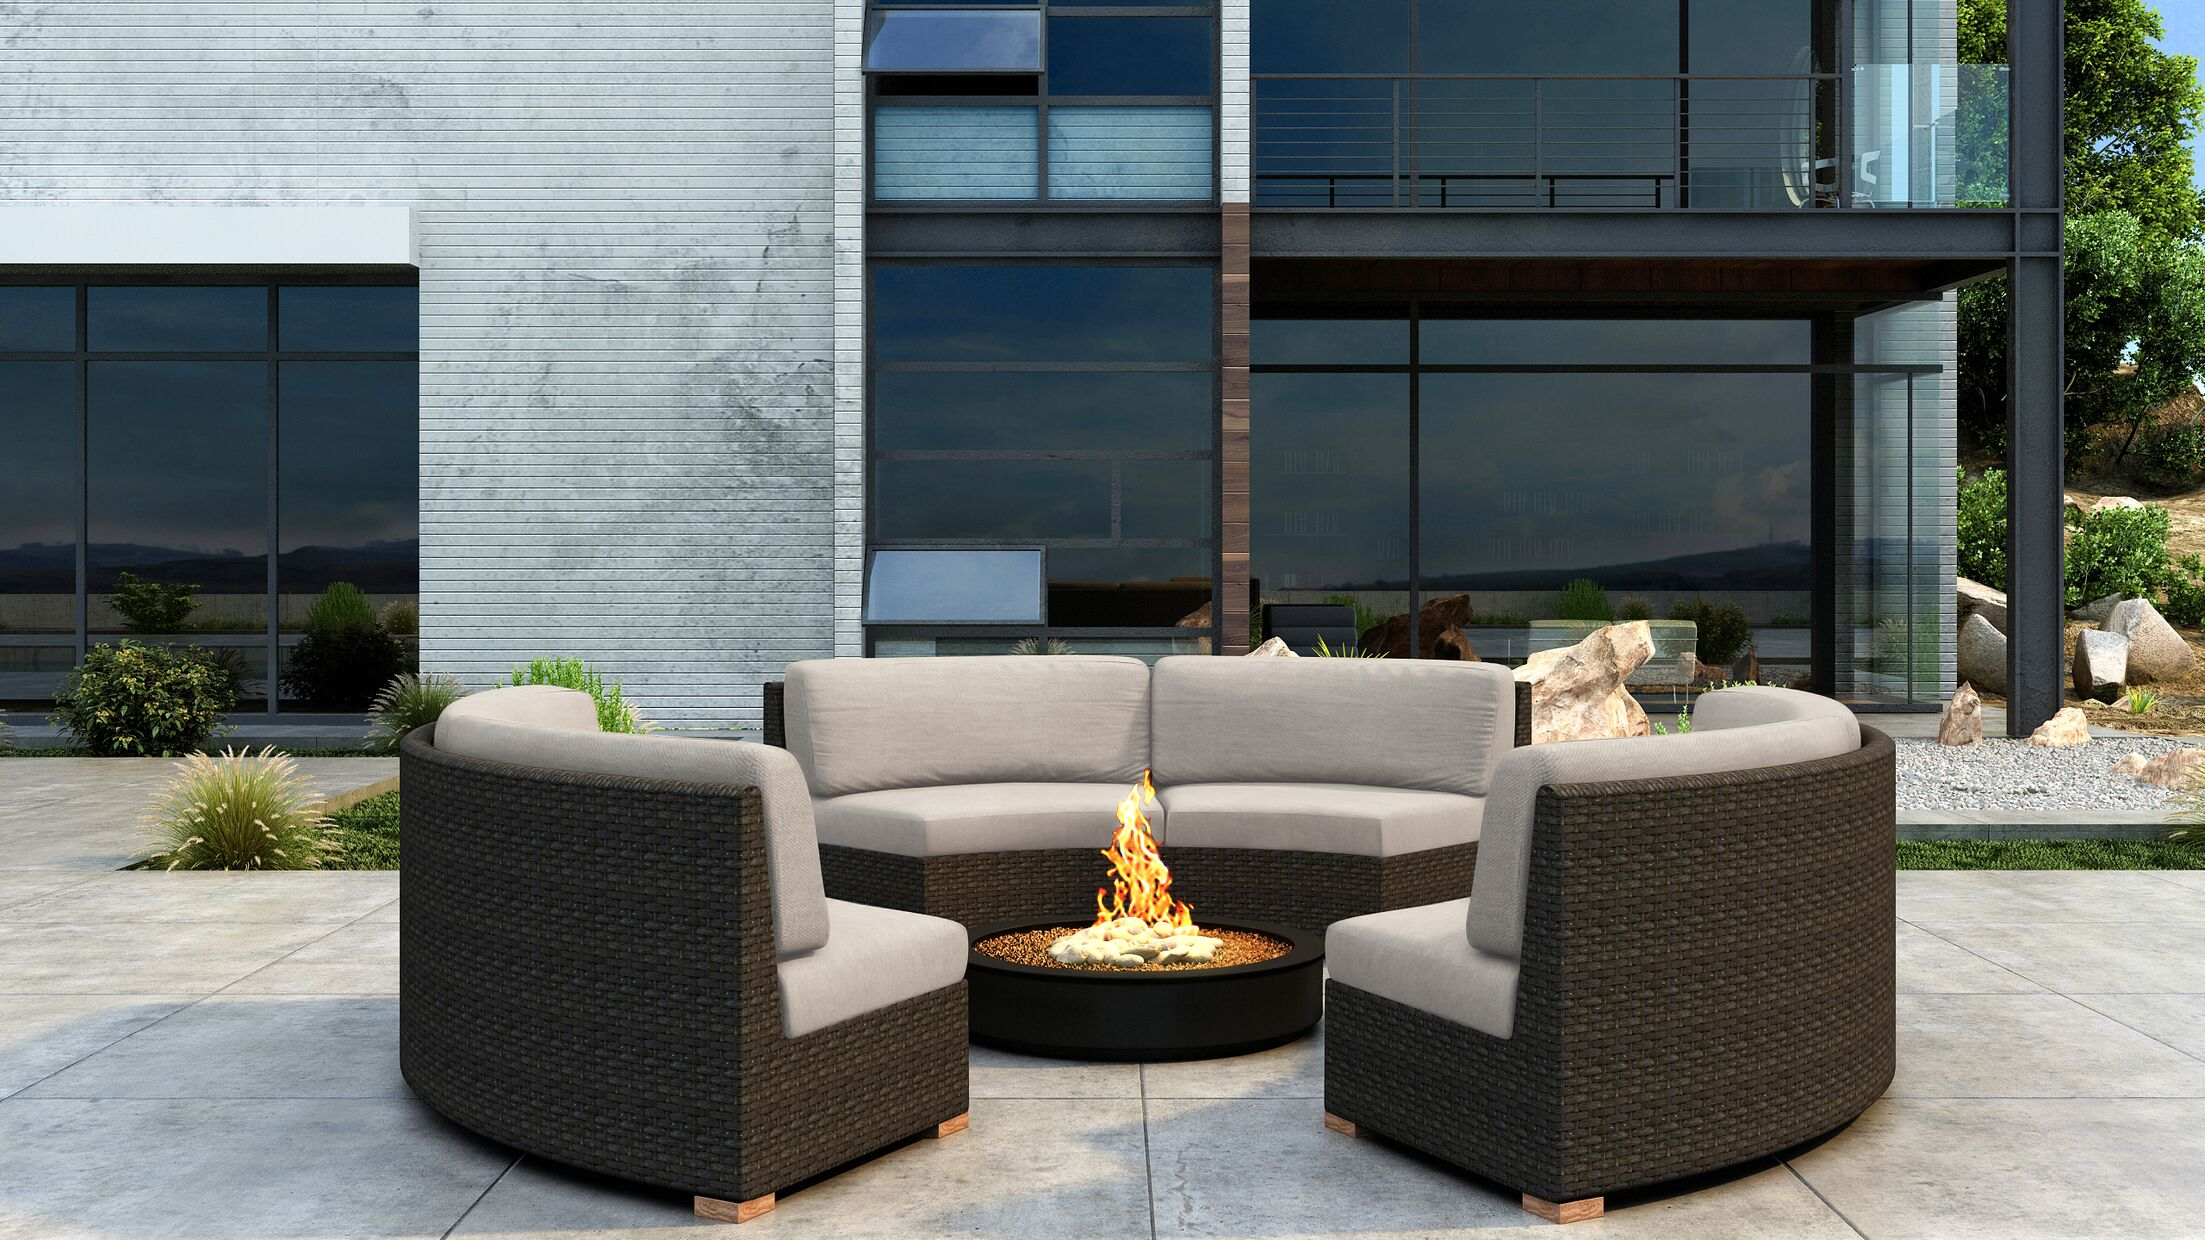 Glen Ellyn 3 Piece Sectional Set with Sunbrella Cushion Cushion Color: Canvas Flax